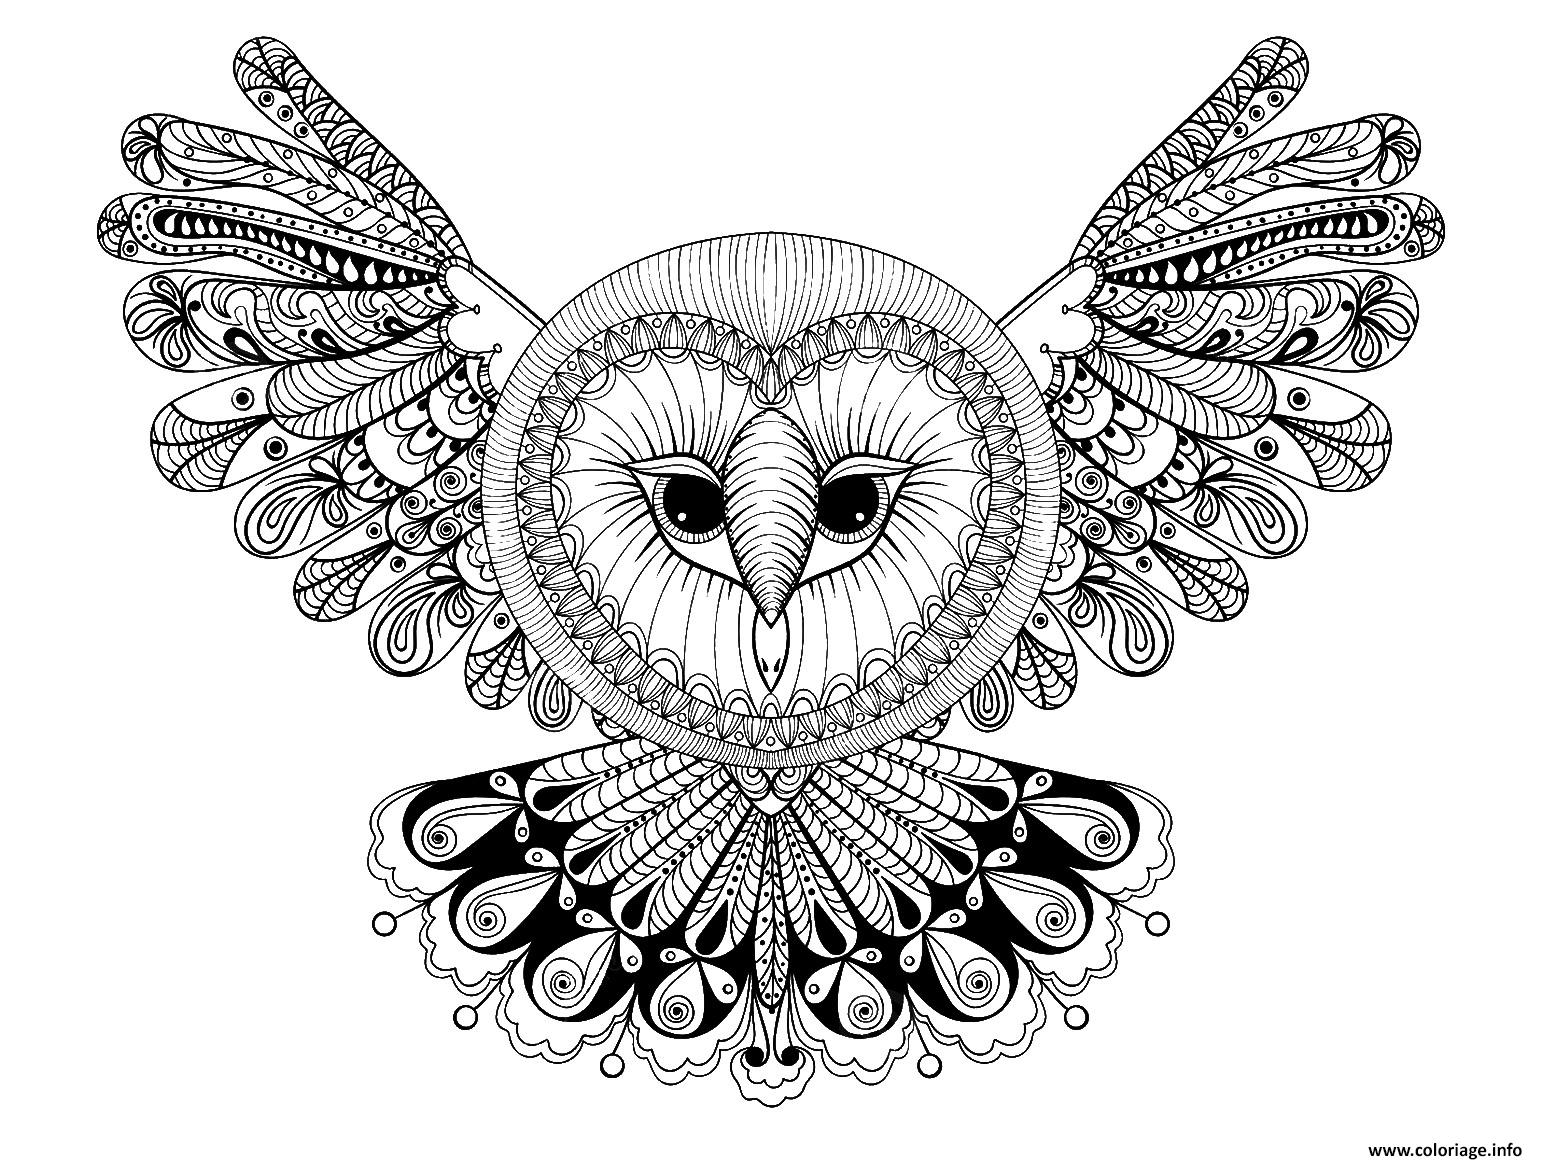 Coloriage hibou avec grande tete forme mandala adulte animaux dessin - Coloriage de hibou ...